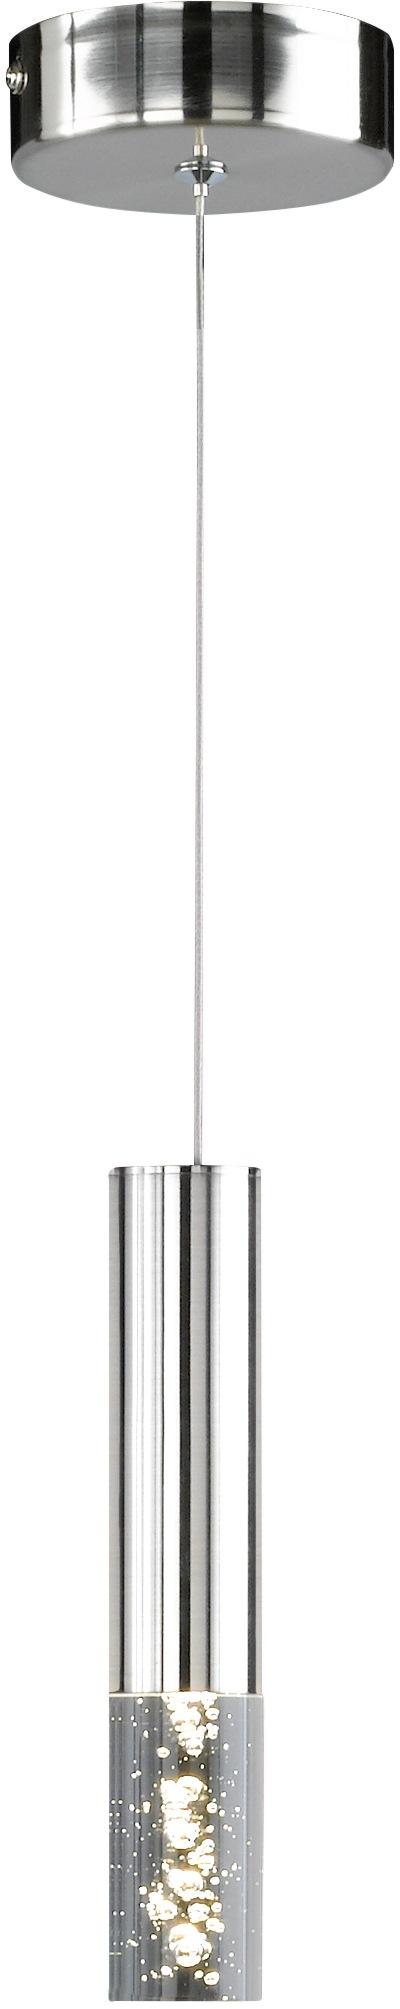 FISCHER & HONSEL LED Pendelleuchte Bubble, LED-Modul, Warmweiß